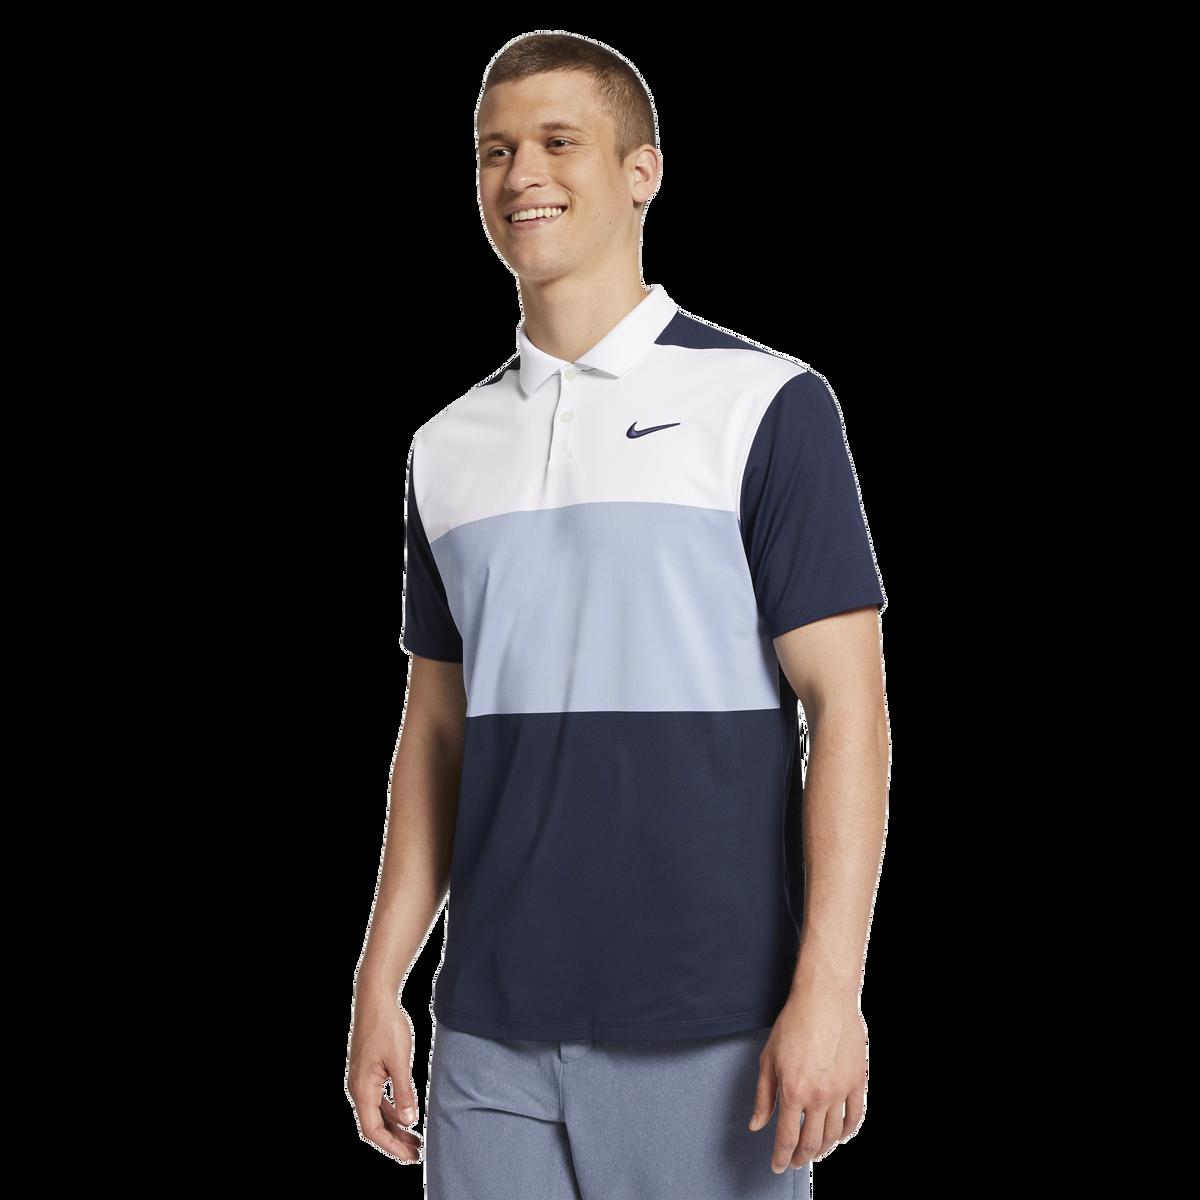 80802a7a Nike Dri-FIT Vapor Block Stripe Golf Polo | PGA TOUR Superstore